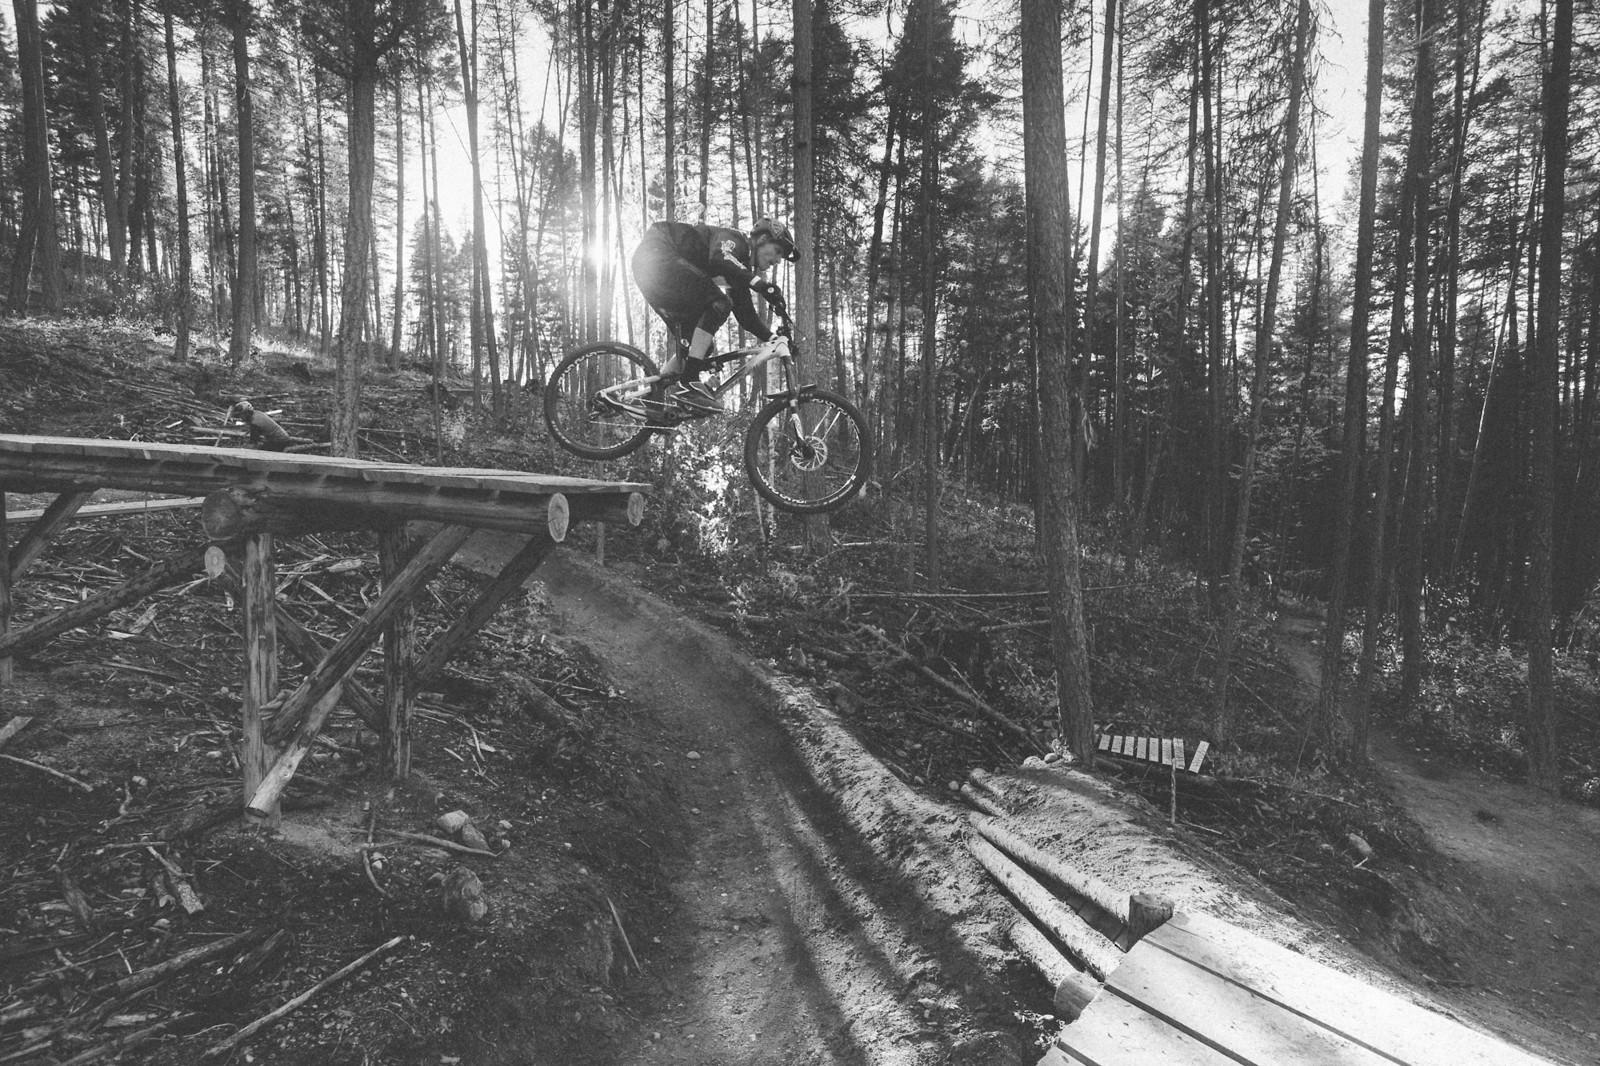 20171015- MOP6355 - marc_obrien - Mountain Biking Pictures - Vital MTB